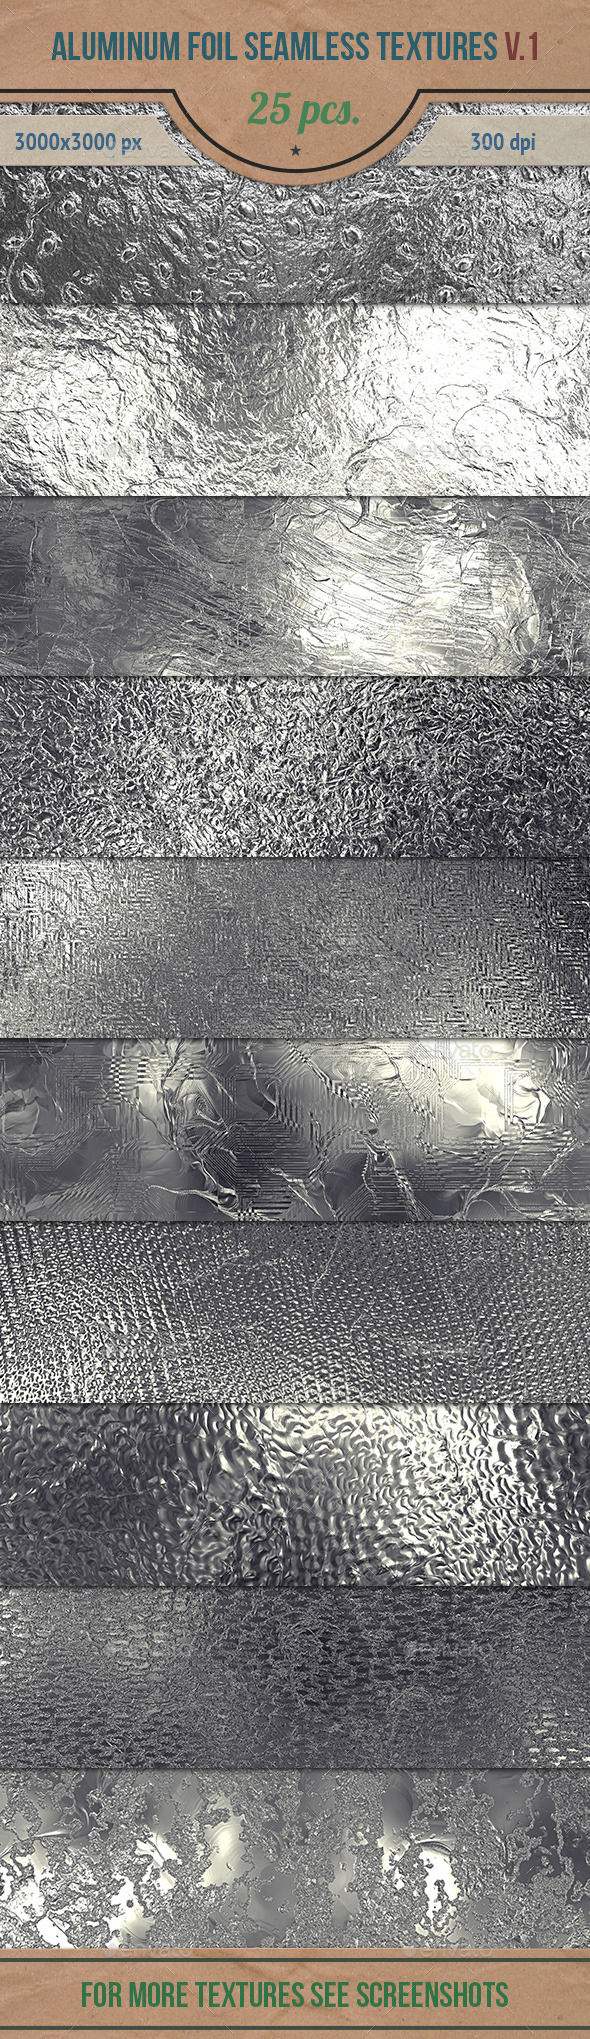 Aluminum Foil Seamless HD Textures Pack v.1 - Metal Textures